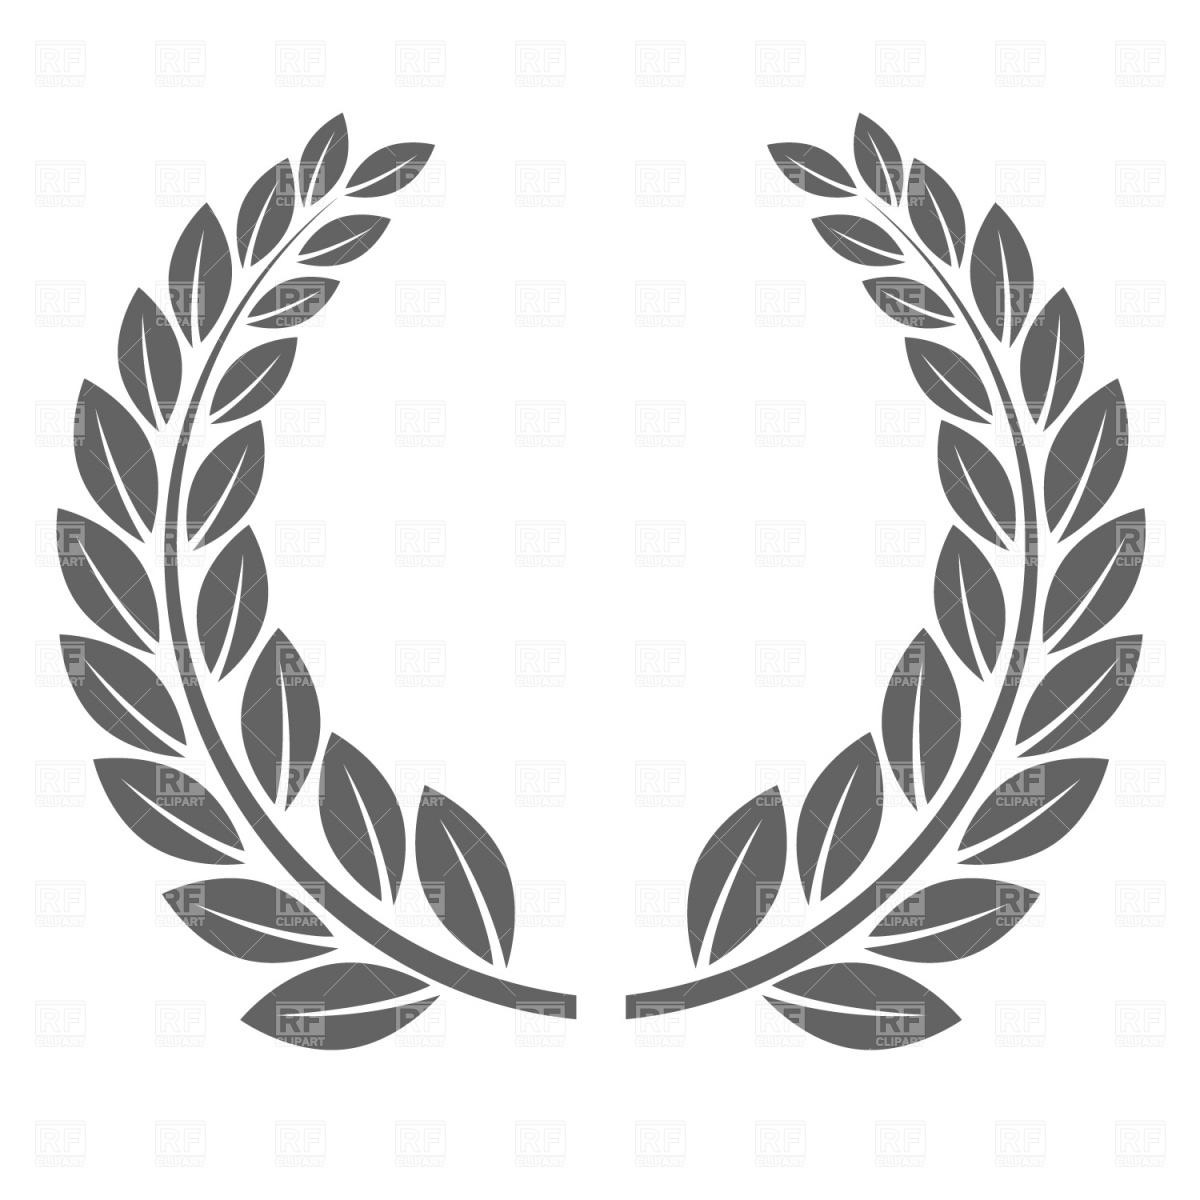 Free wreath cliparts download. Laurel clipart weath